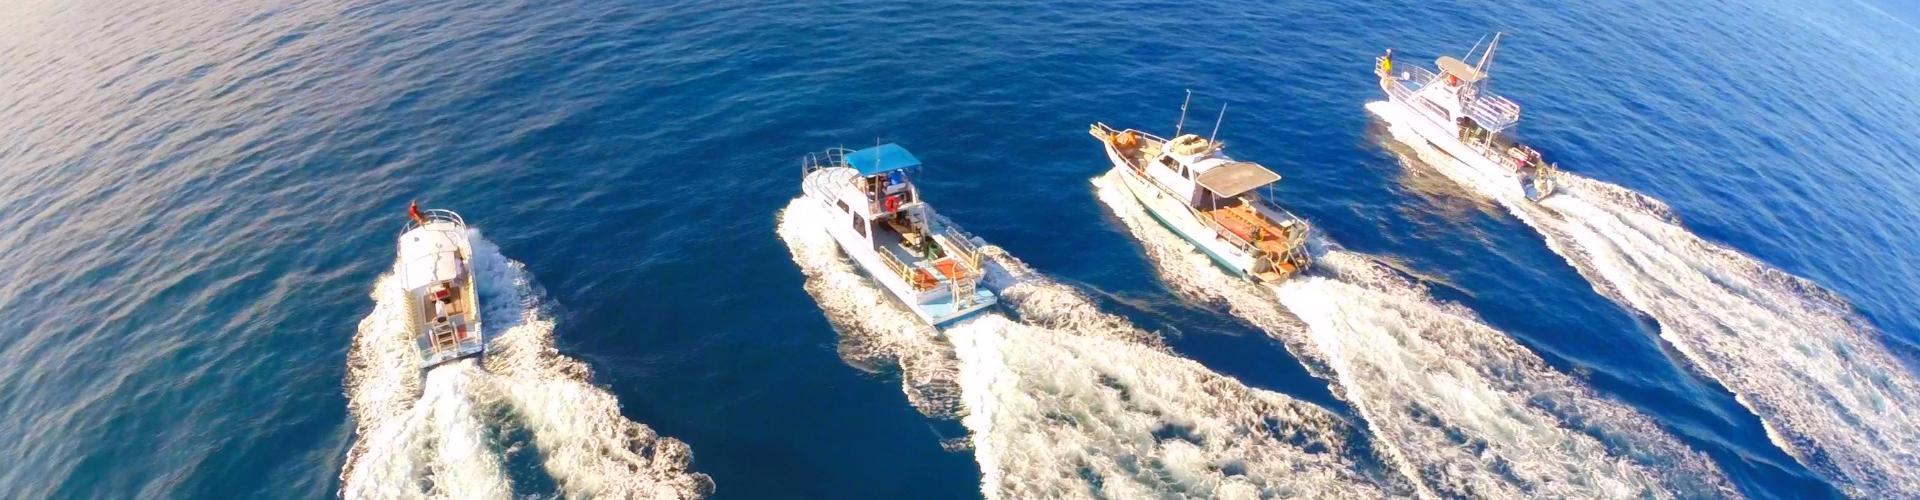 Jack's Diving Locker Boats - Aerial